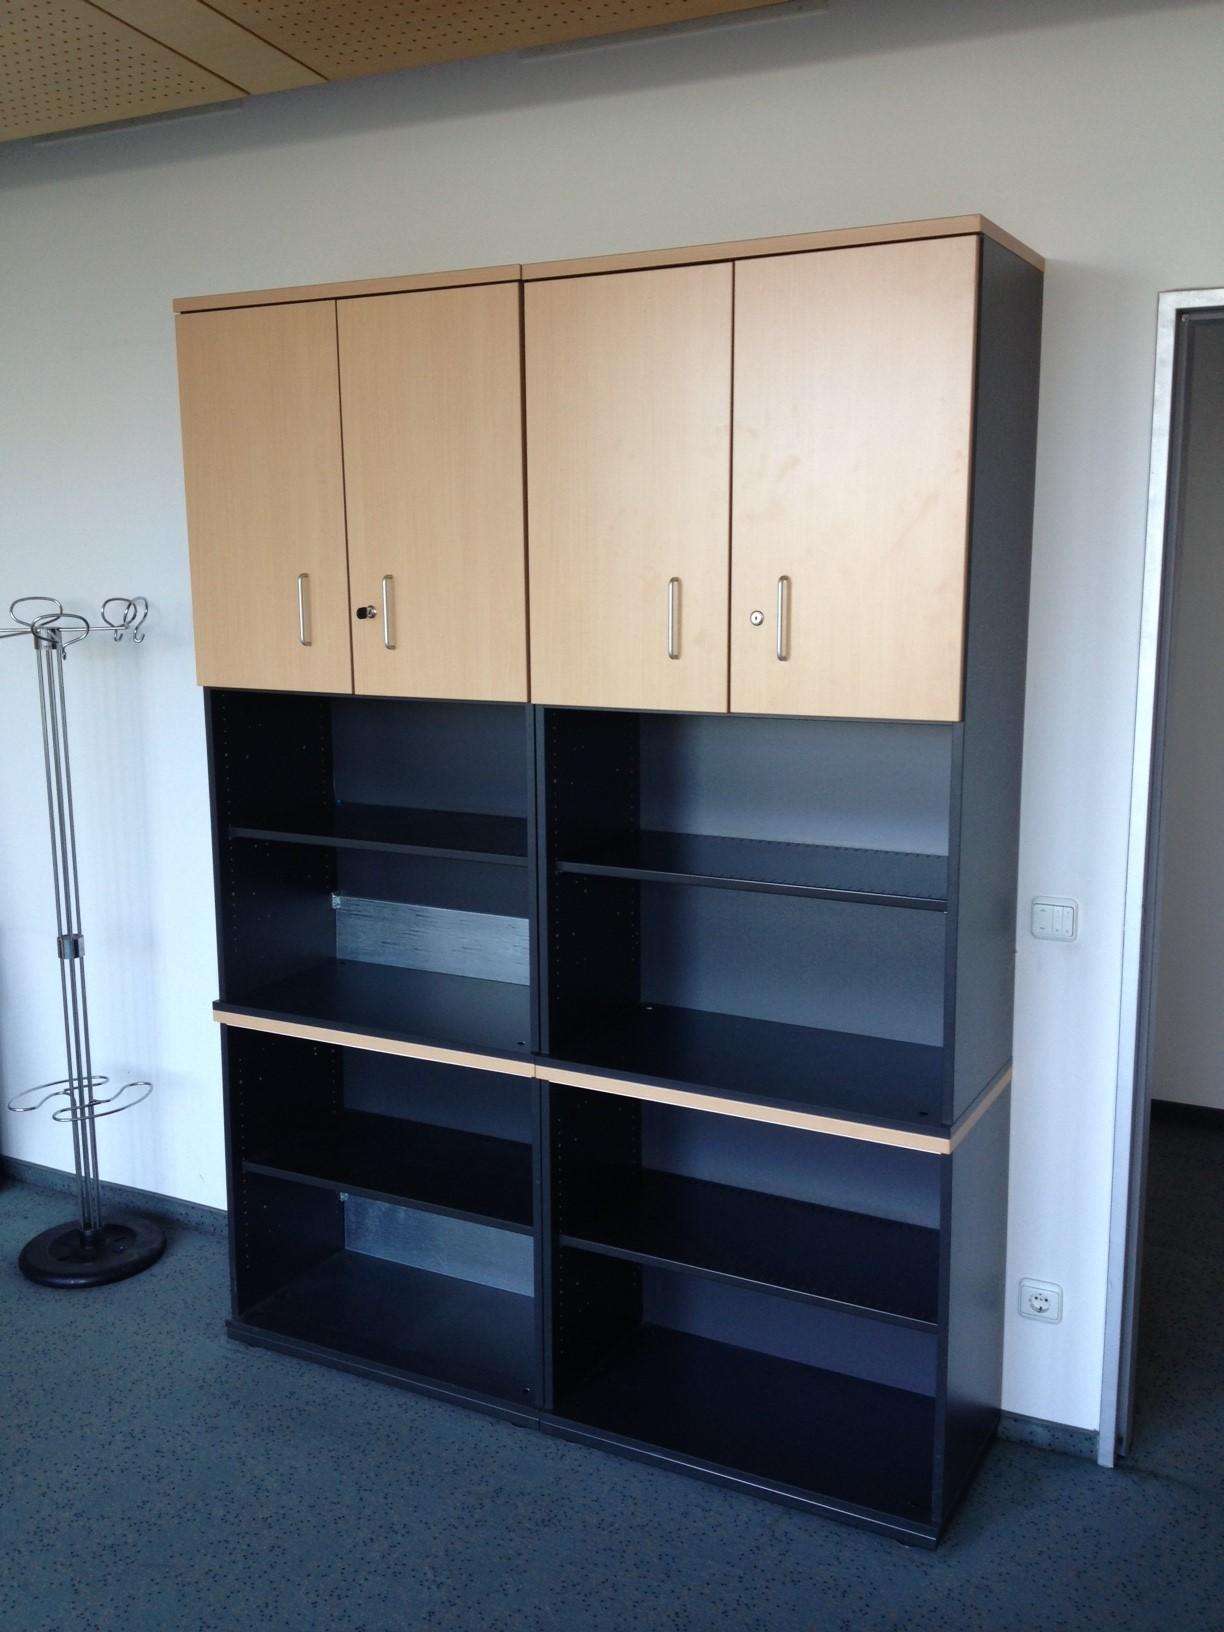 2teiliger aktenschrank regal in buche anthrazit. Black Bedroom Furniture Sets. Home Design Ideas